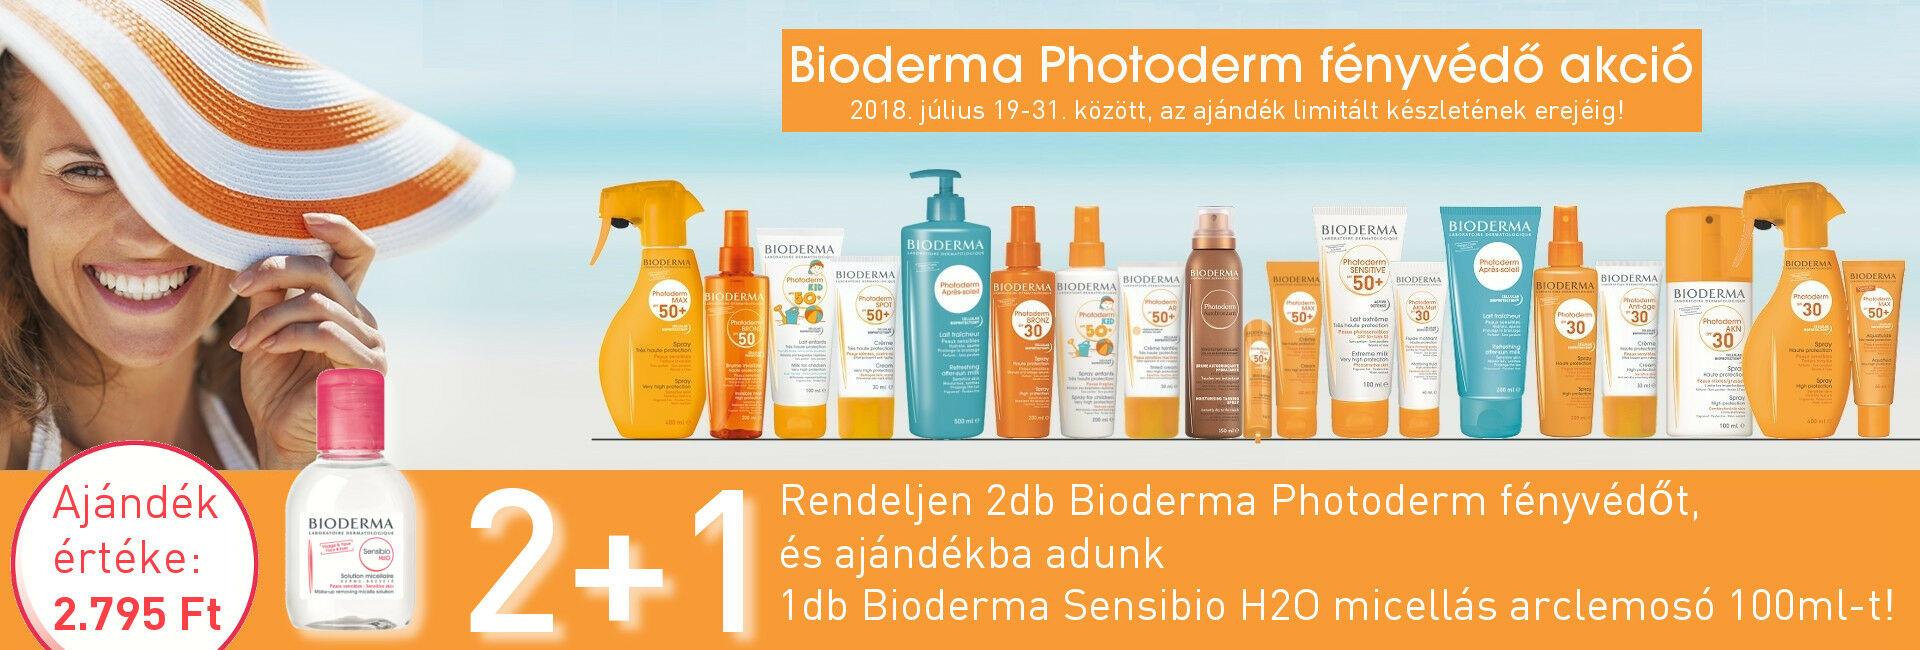 Bioderma Photoderm 2+1 akció